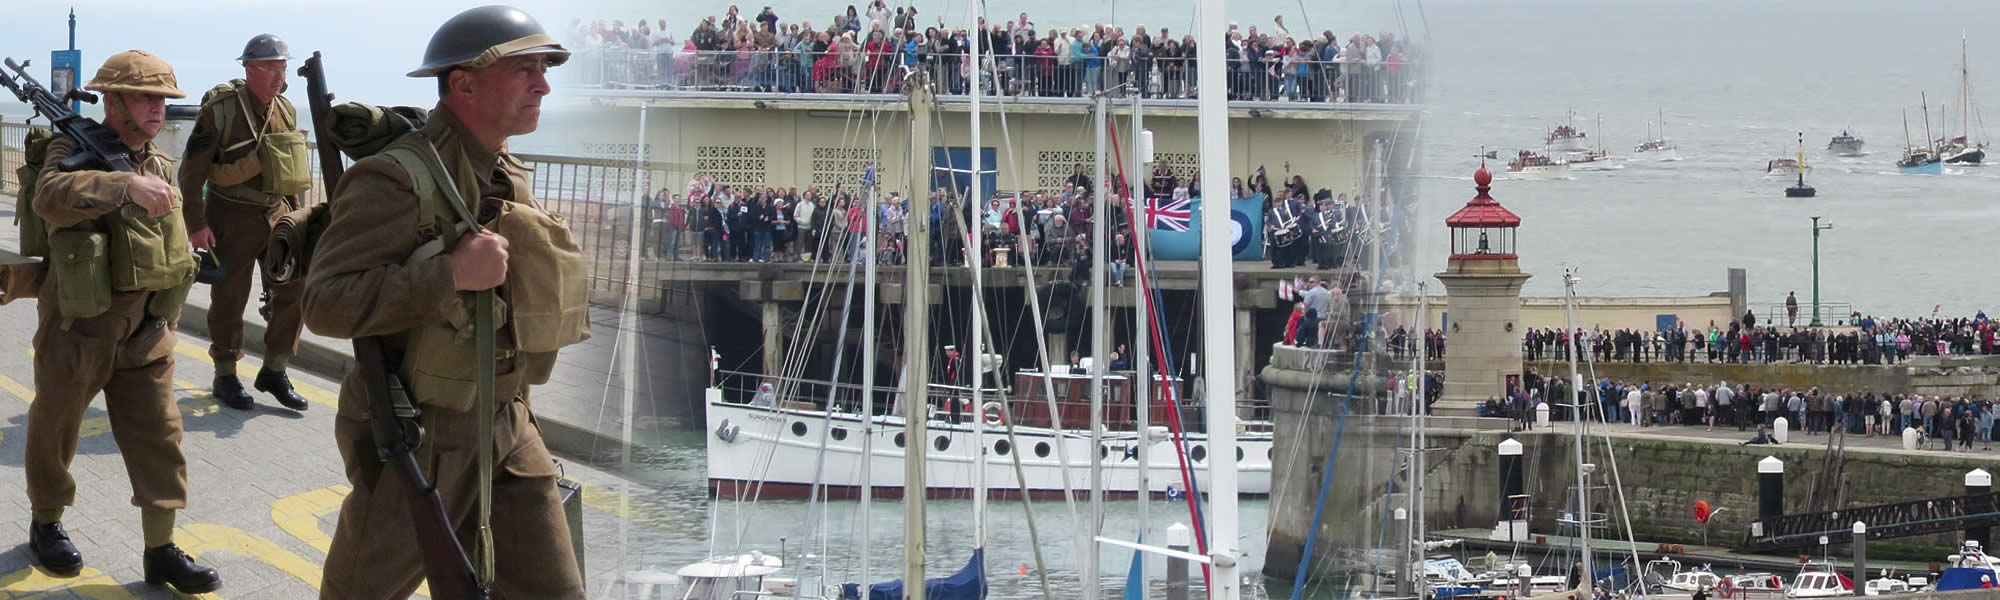 Dunkirk Little Ships - Visit Ramsgate